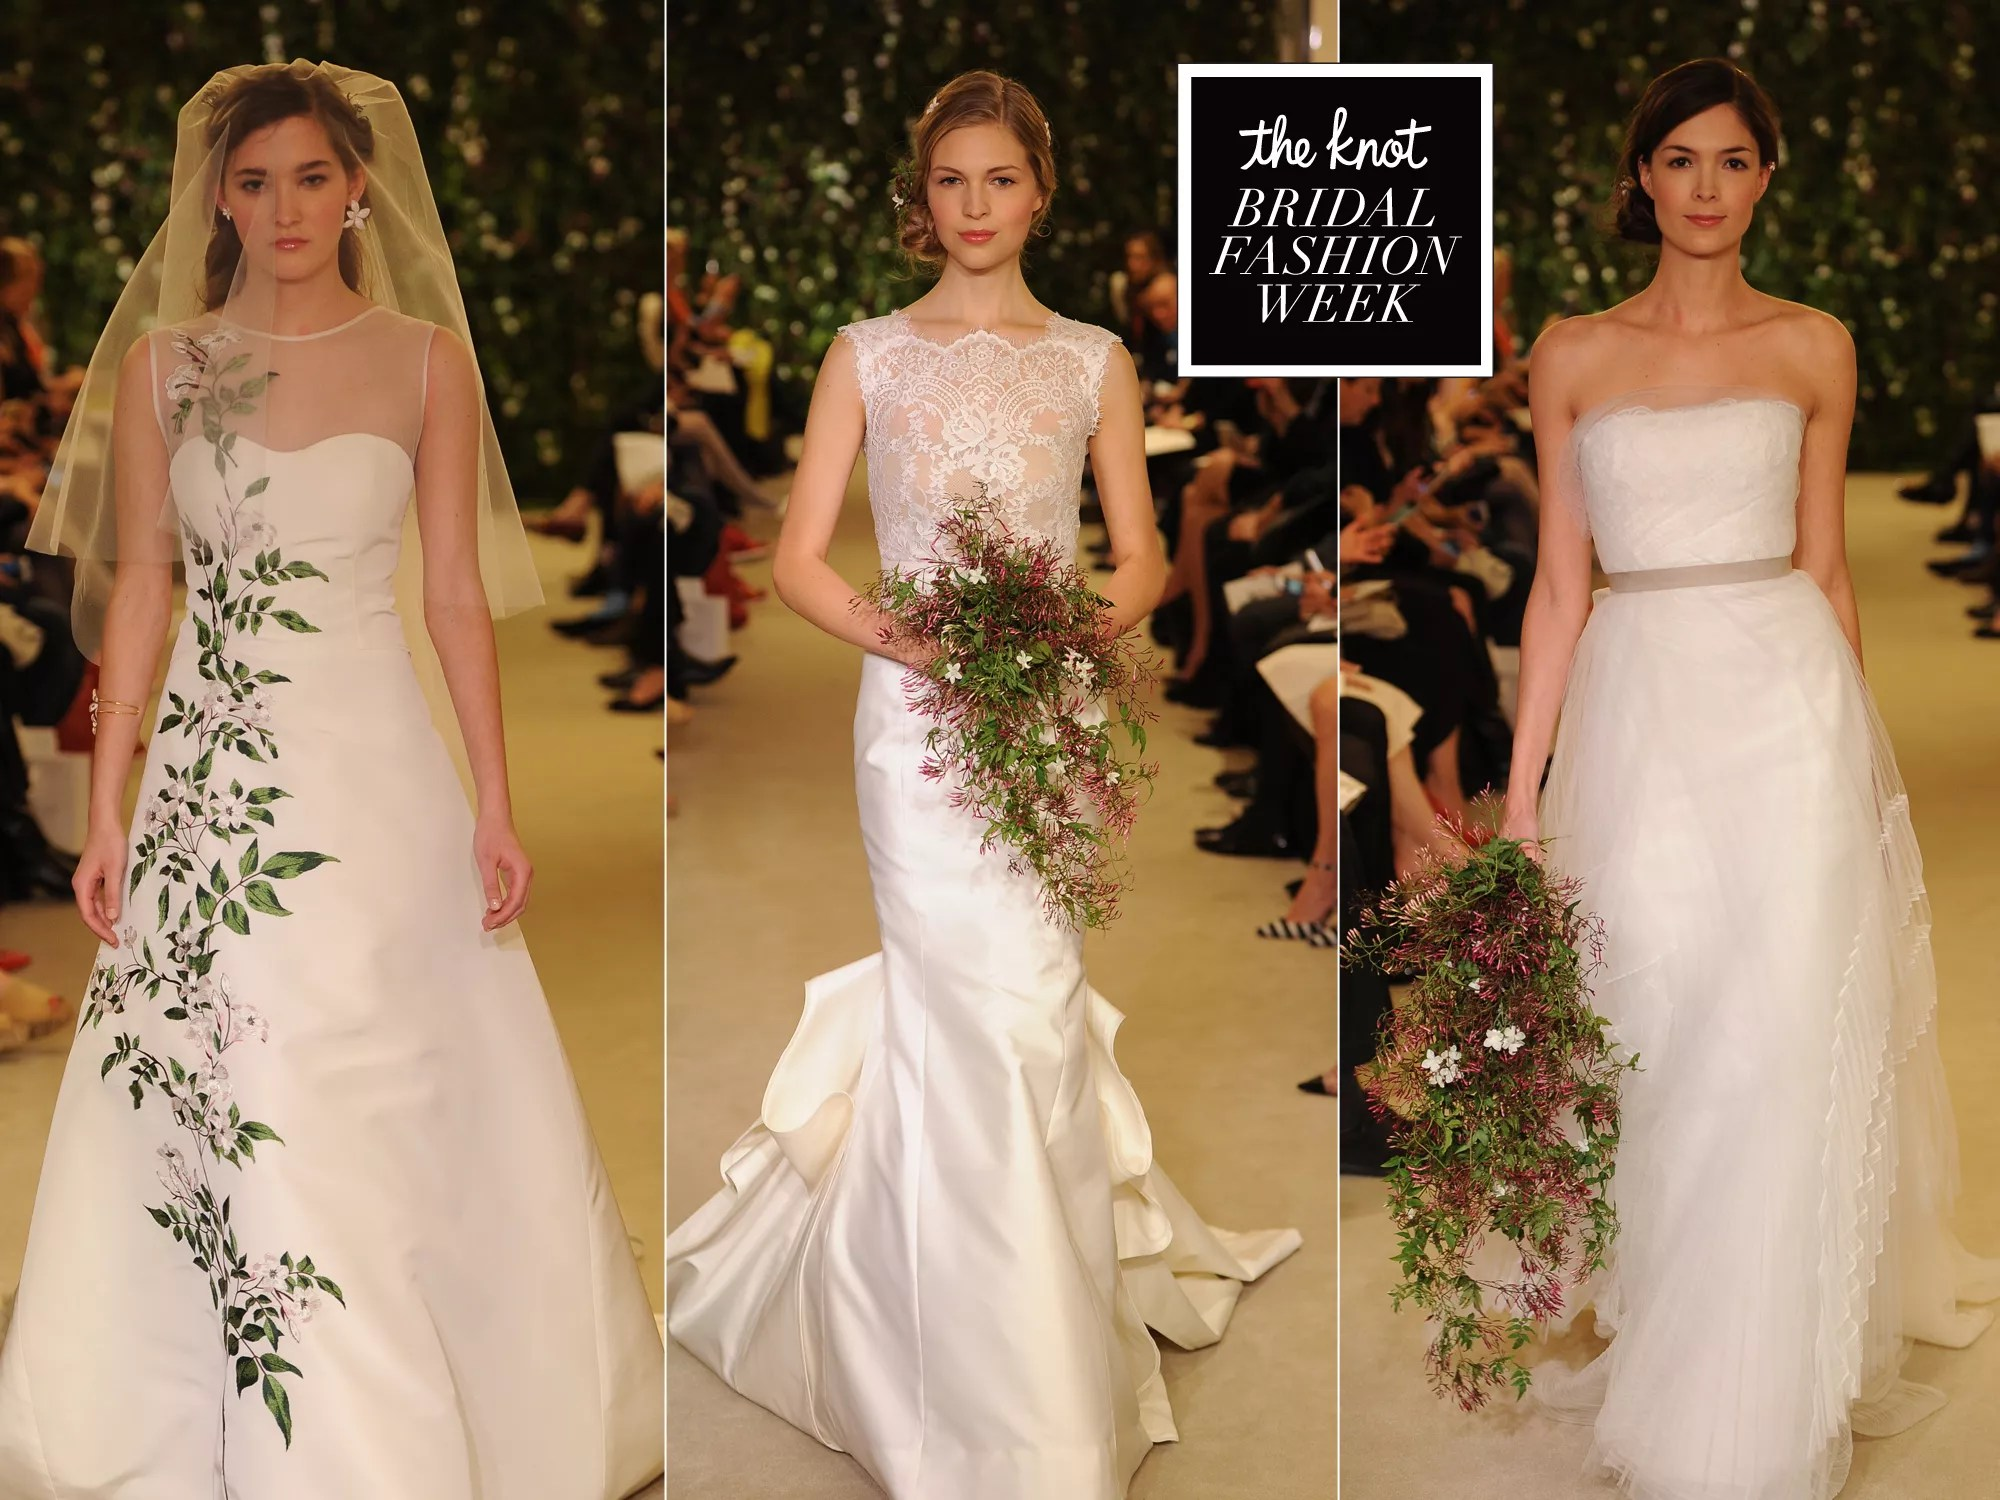 Carolina Herrera Spring Wedding Dresses: Bridal Fashion